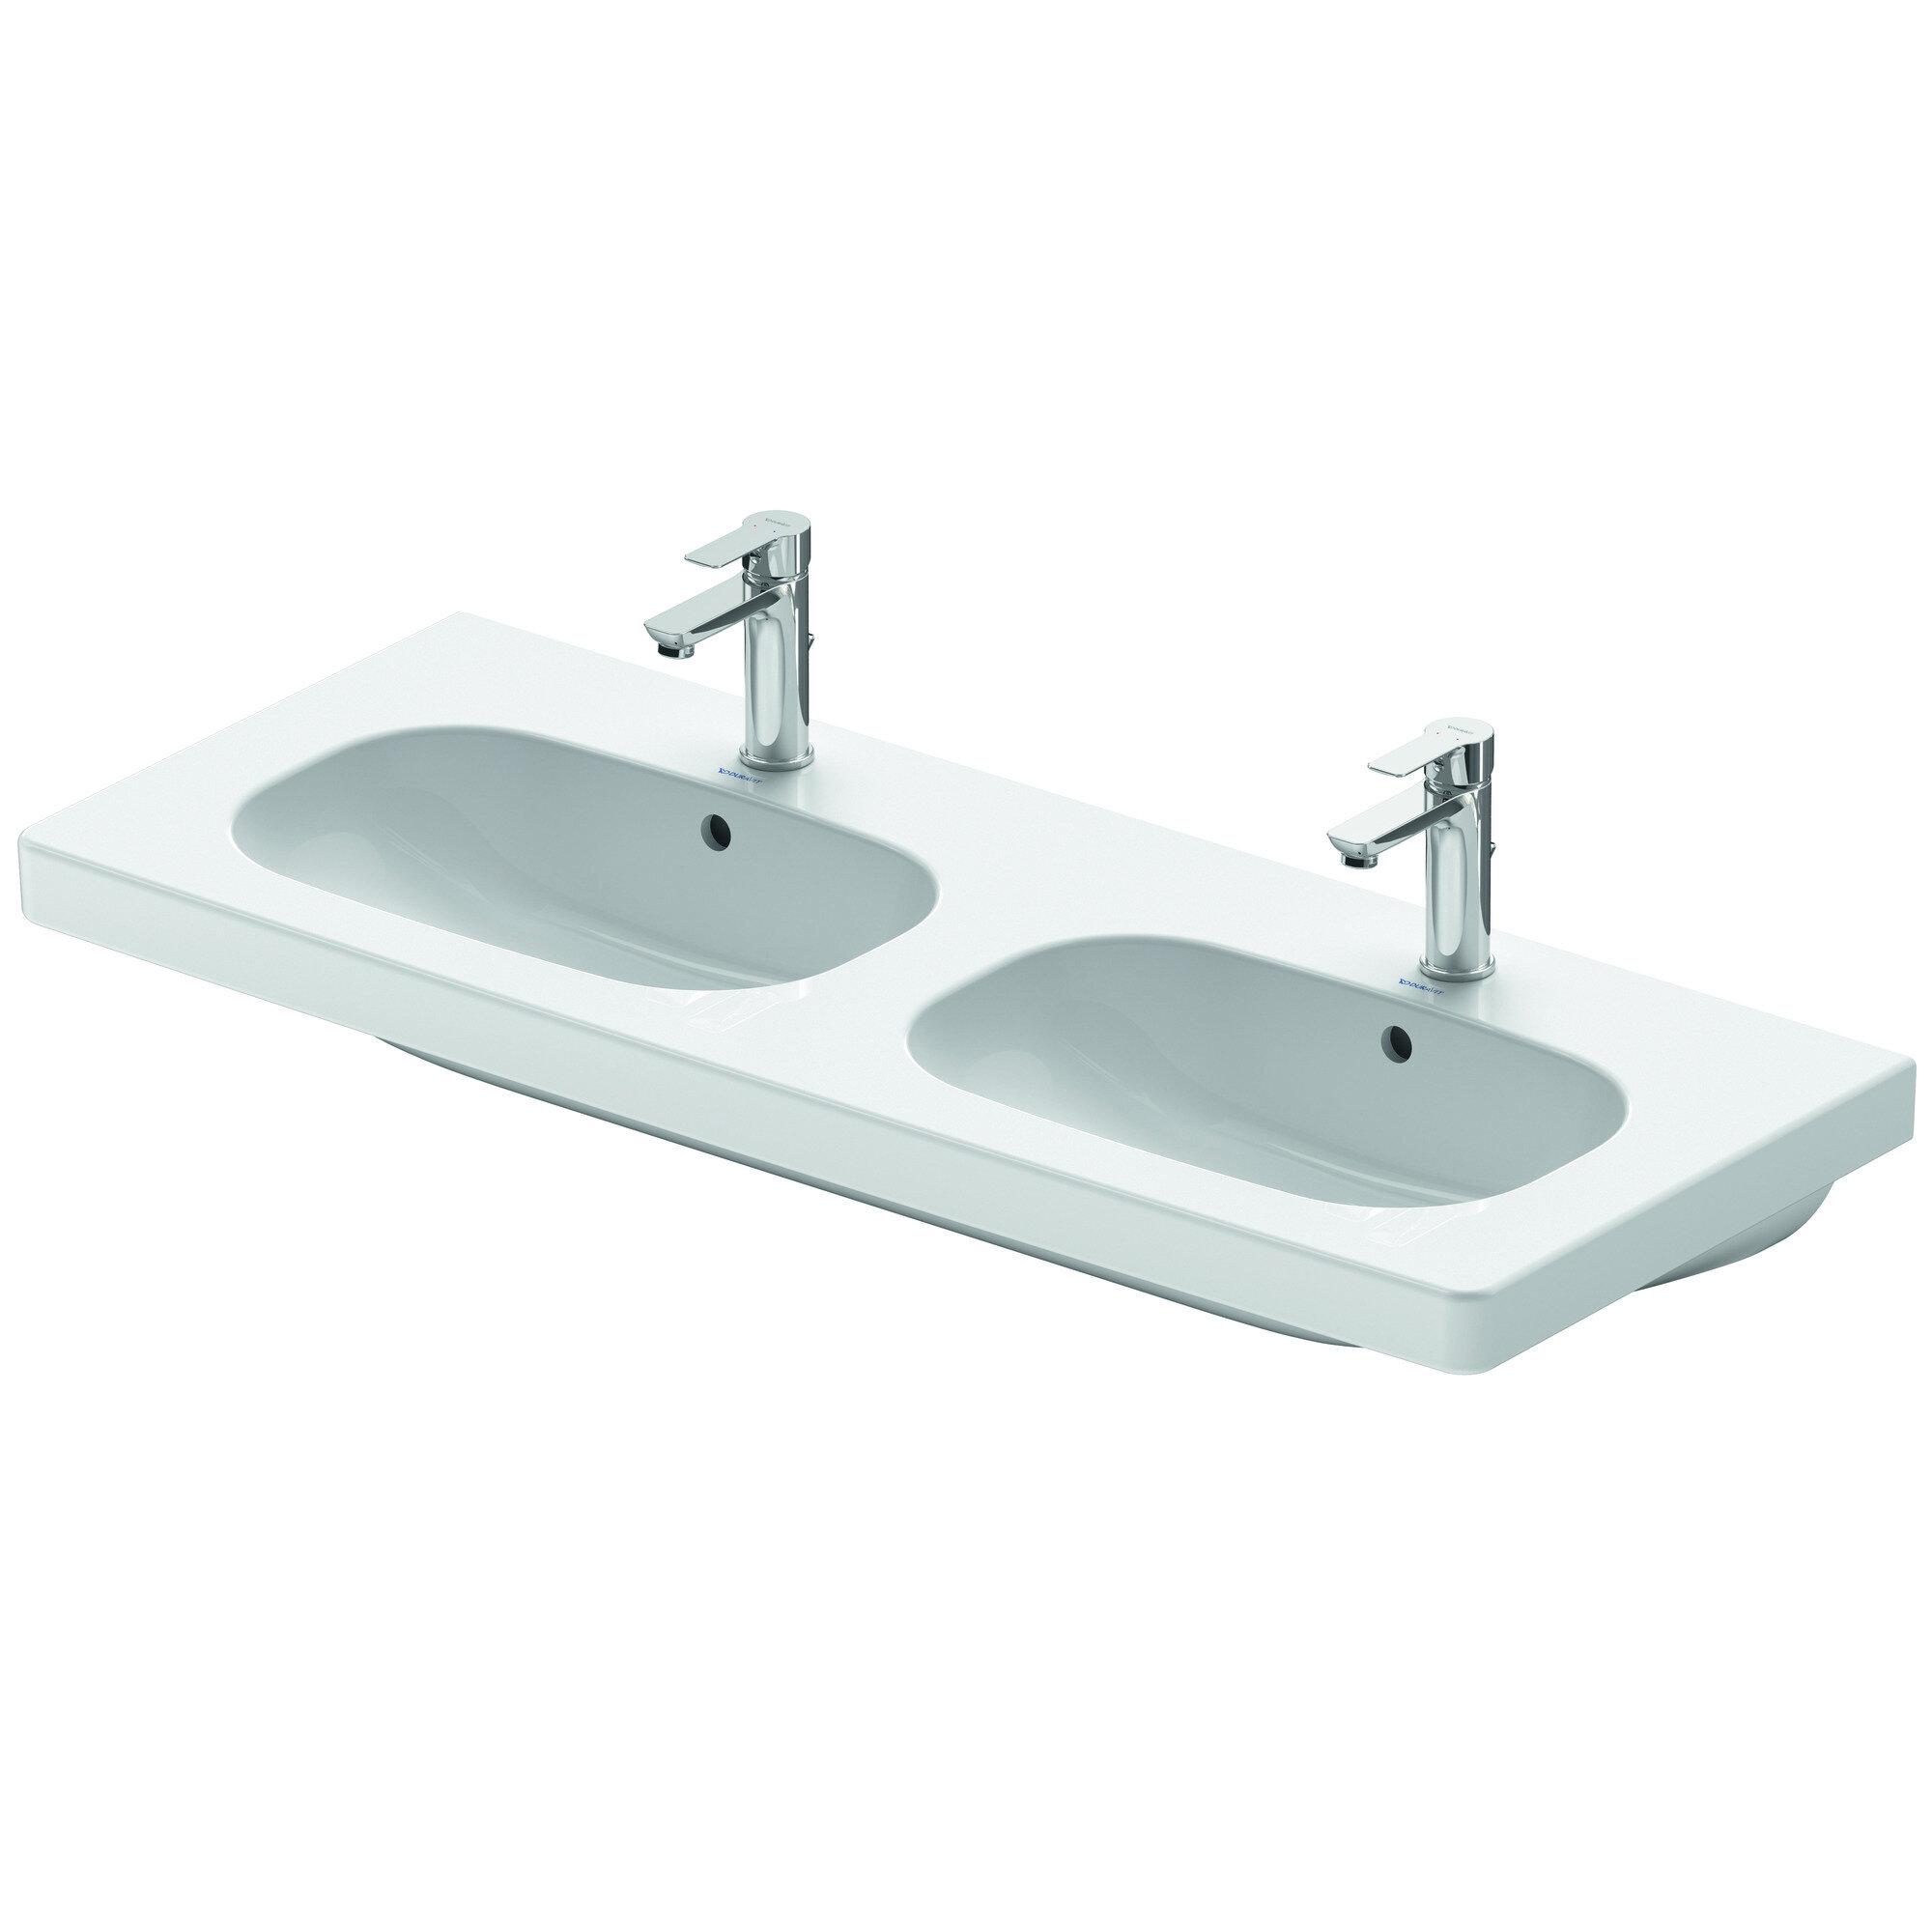 Duravit White Ceramic Rectangular Wall Mount Bathroom Sink With Overflow